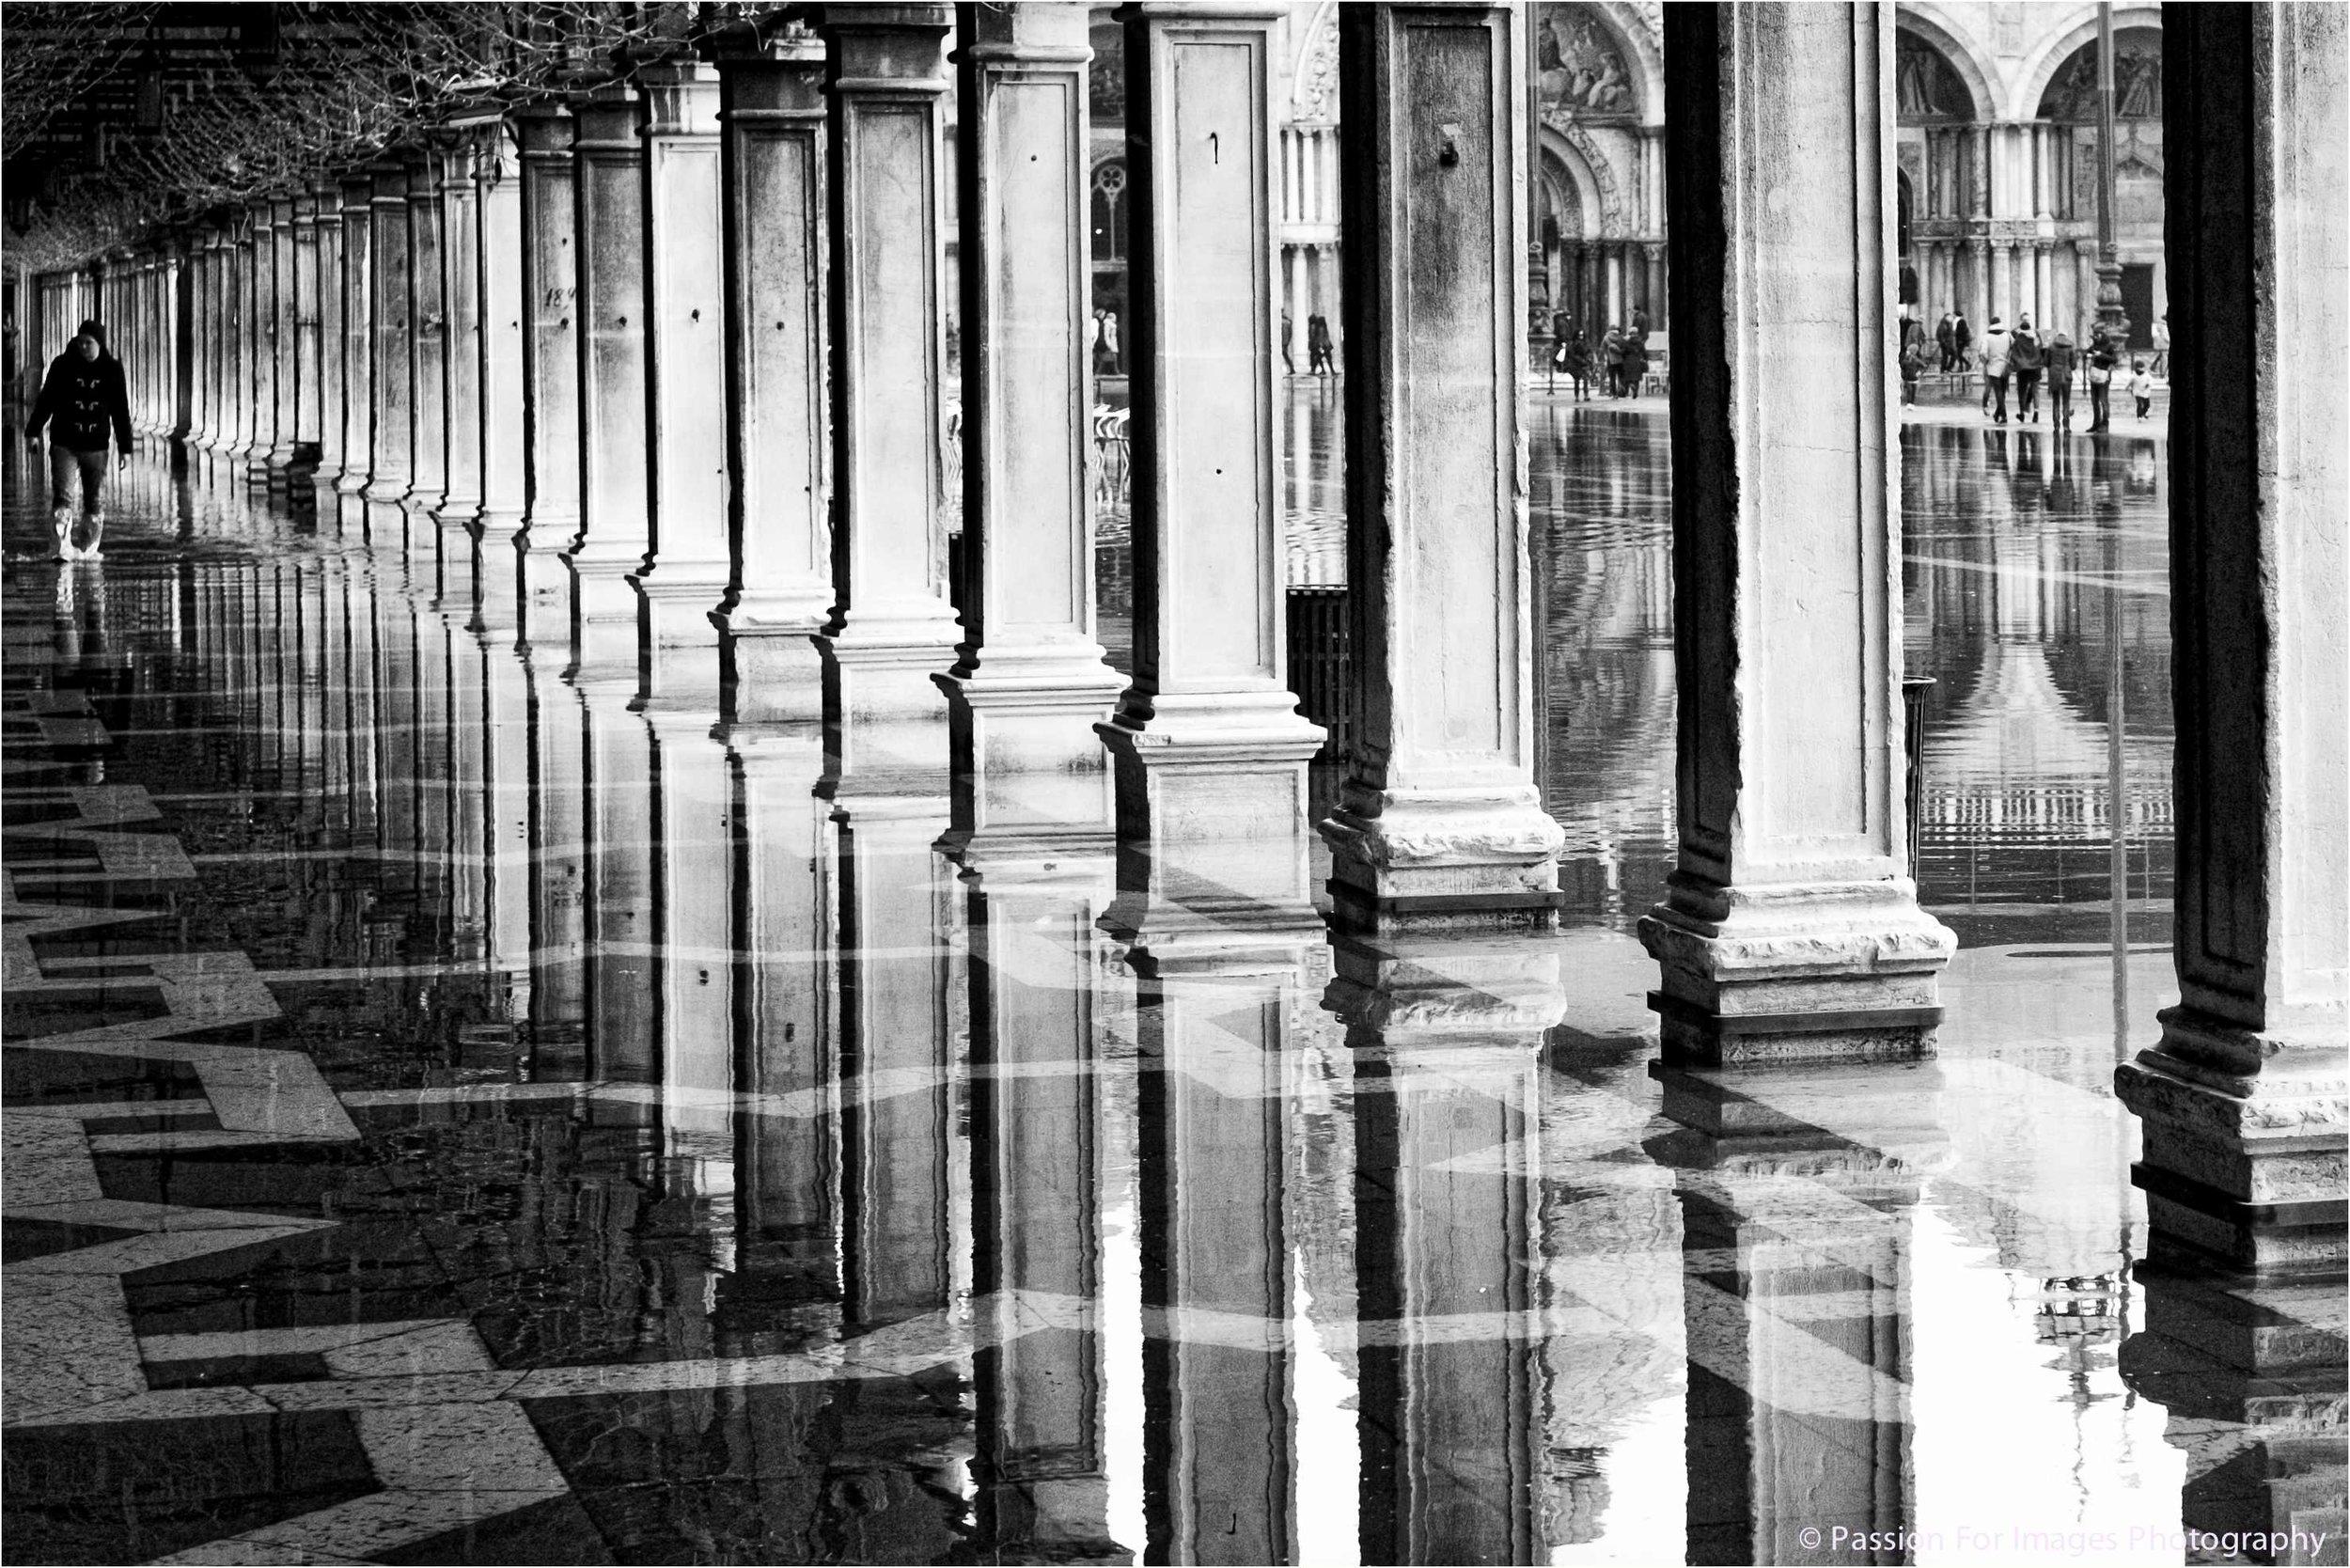 DSCF1673_2016_01_Venice-Edit-Edit-4.jpg